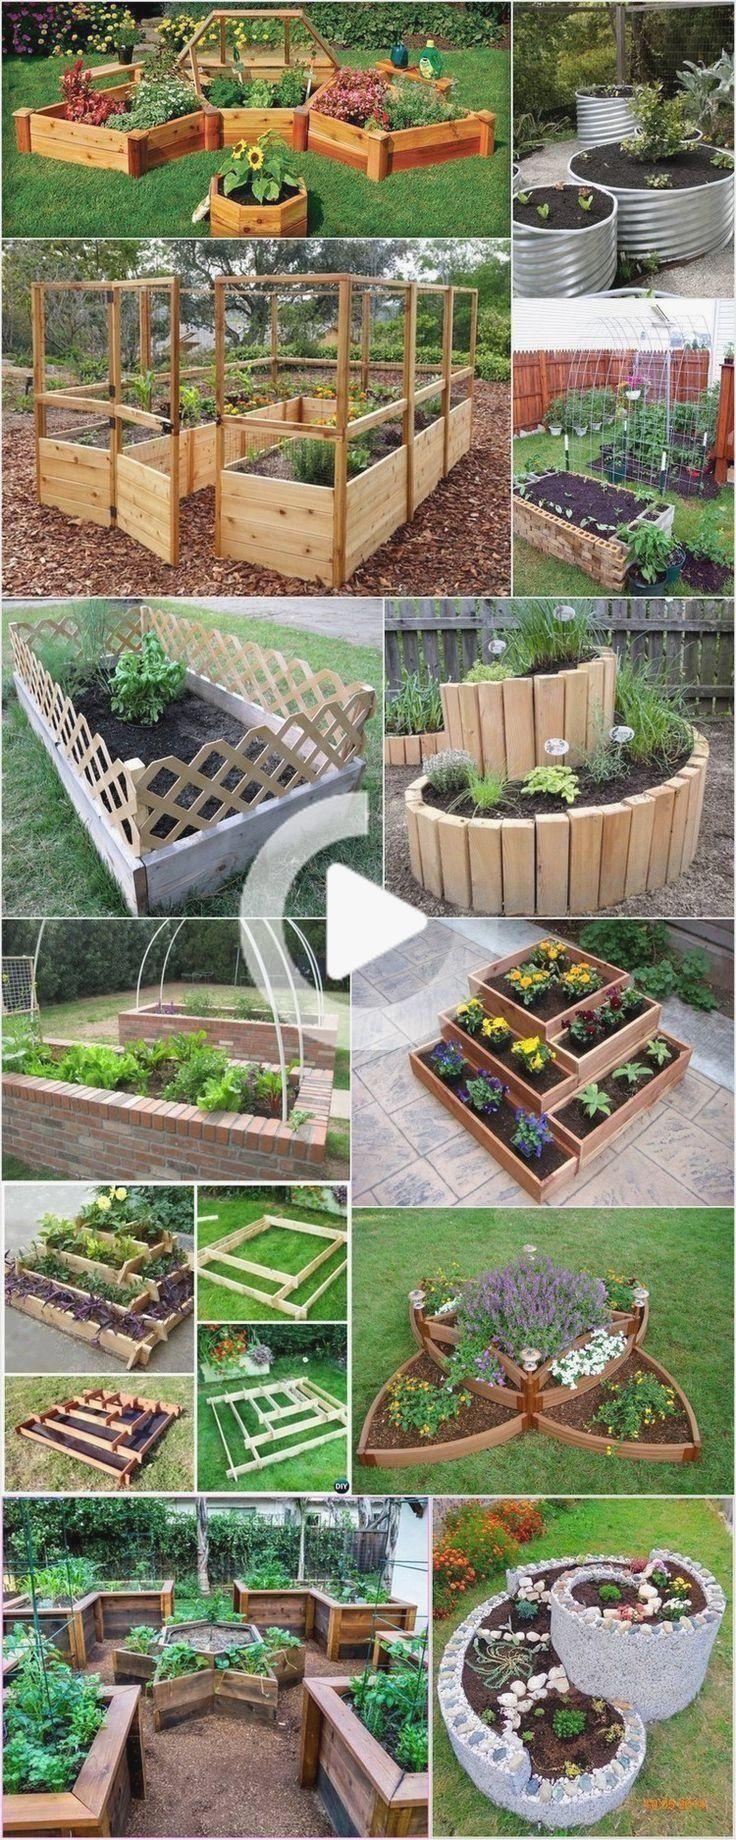 Elegant Garden Projects Diy Budget Backyard Raised Beds Inexpensive Raised Garden Bed In 2020 Vegetable Garden Raised Beds Inexpensive Raised Garden Beds Raised Garden